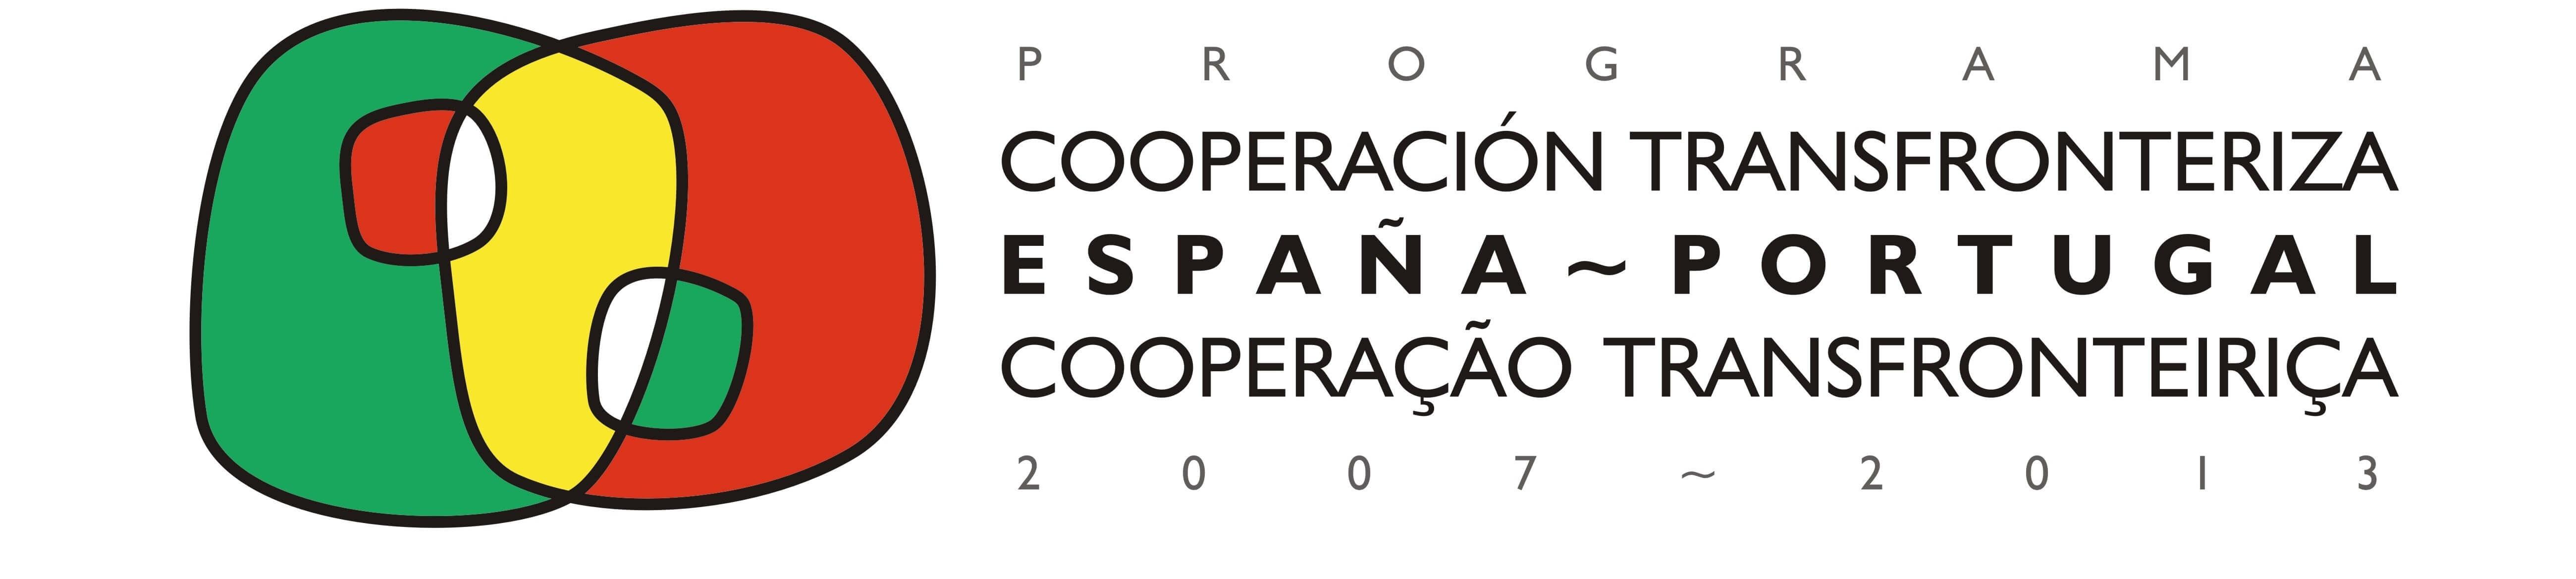 Cooperacion transfronteiriza